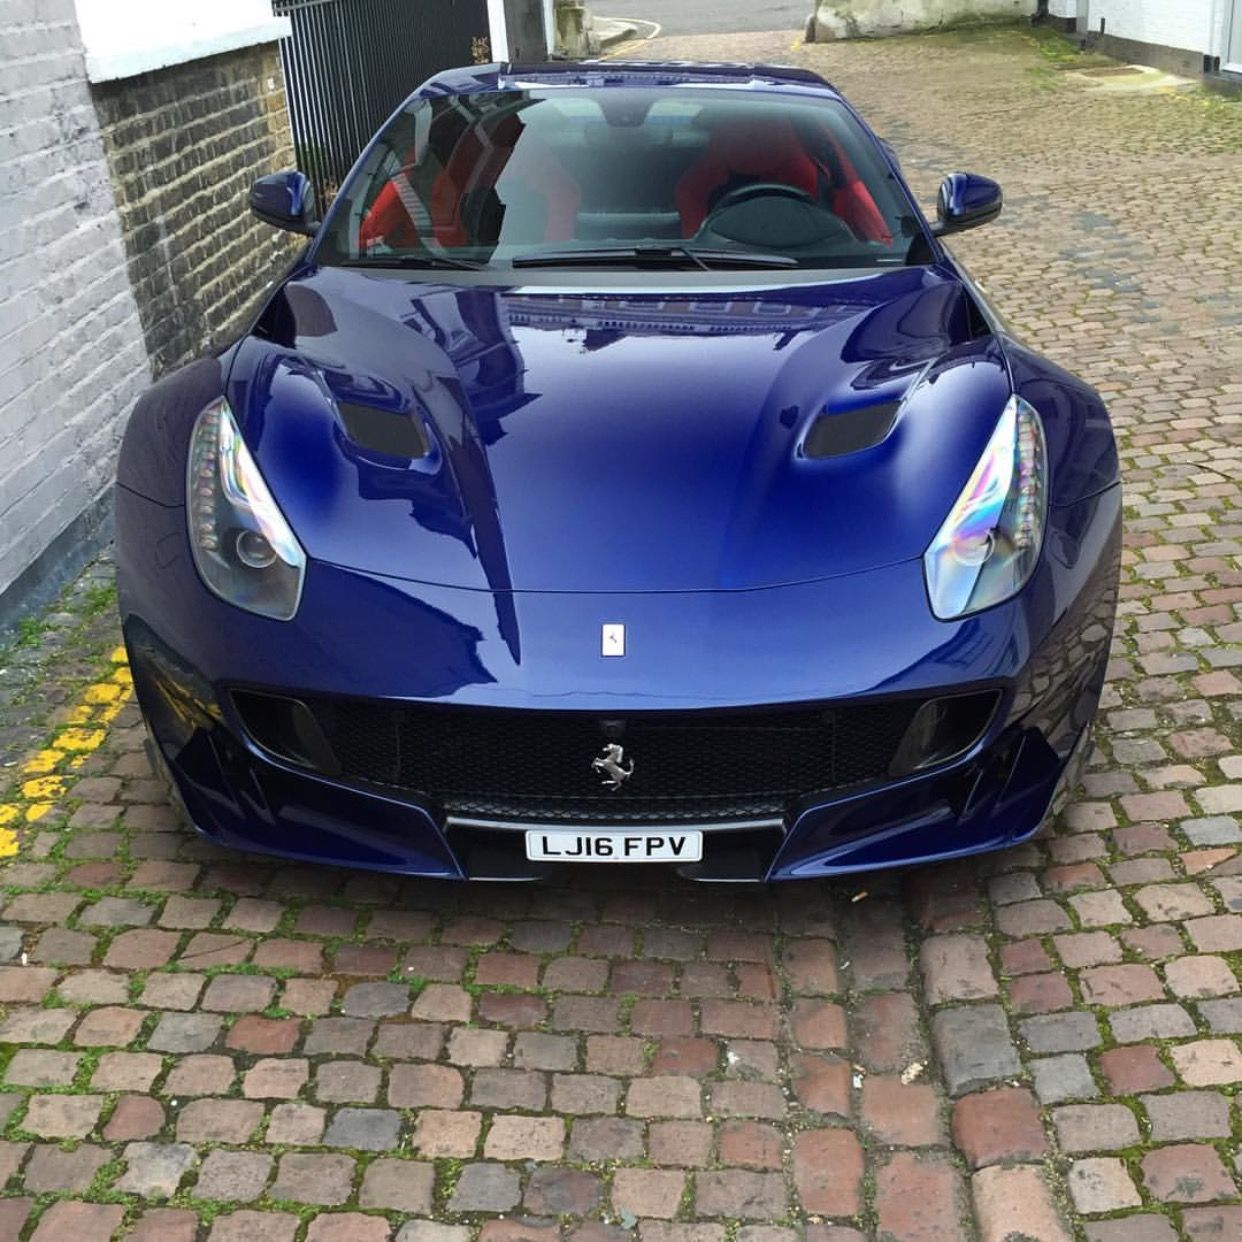 Ferrari f12 tdf painted in le mans blue photo taken by for Interieur voiture de luxe